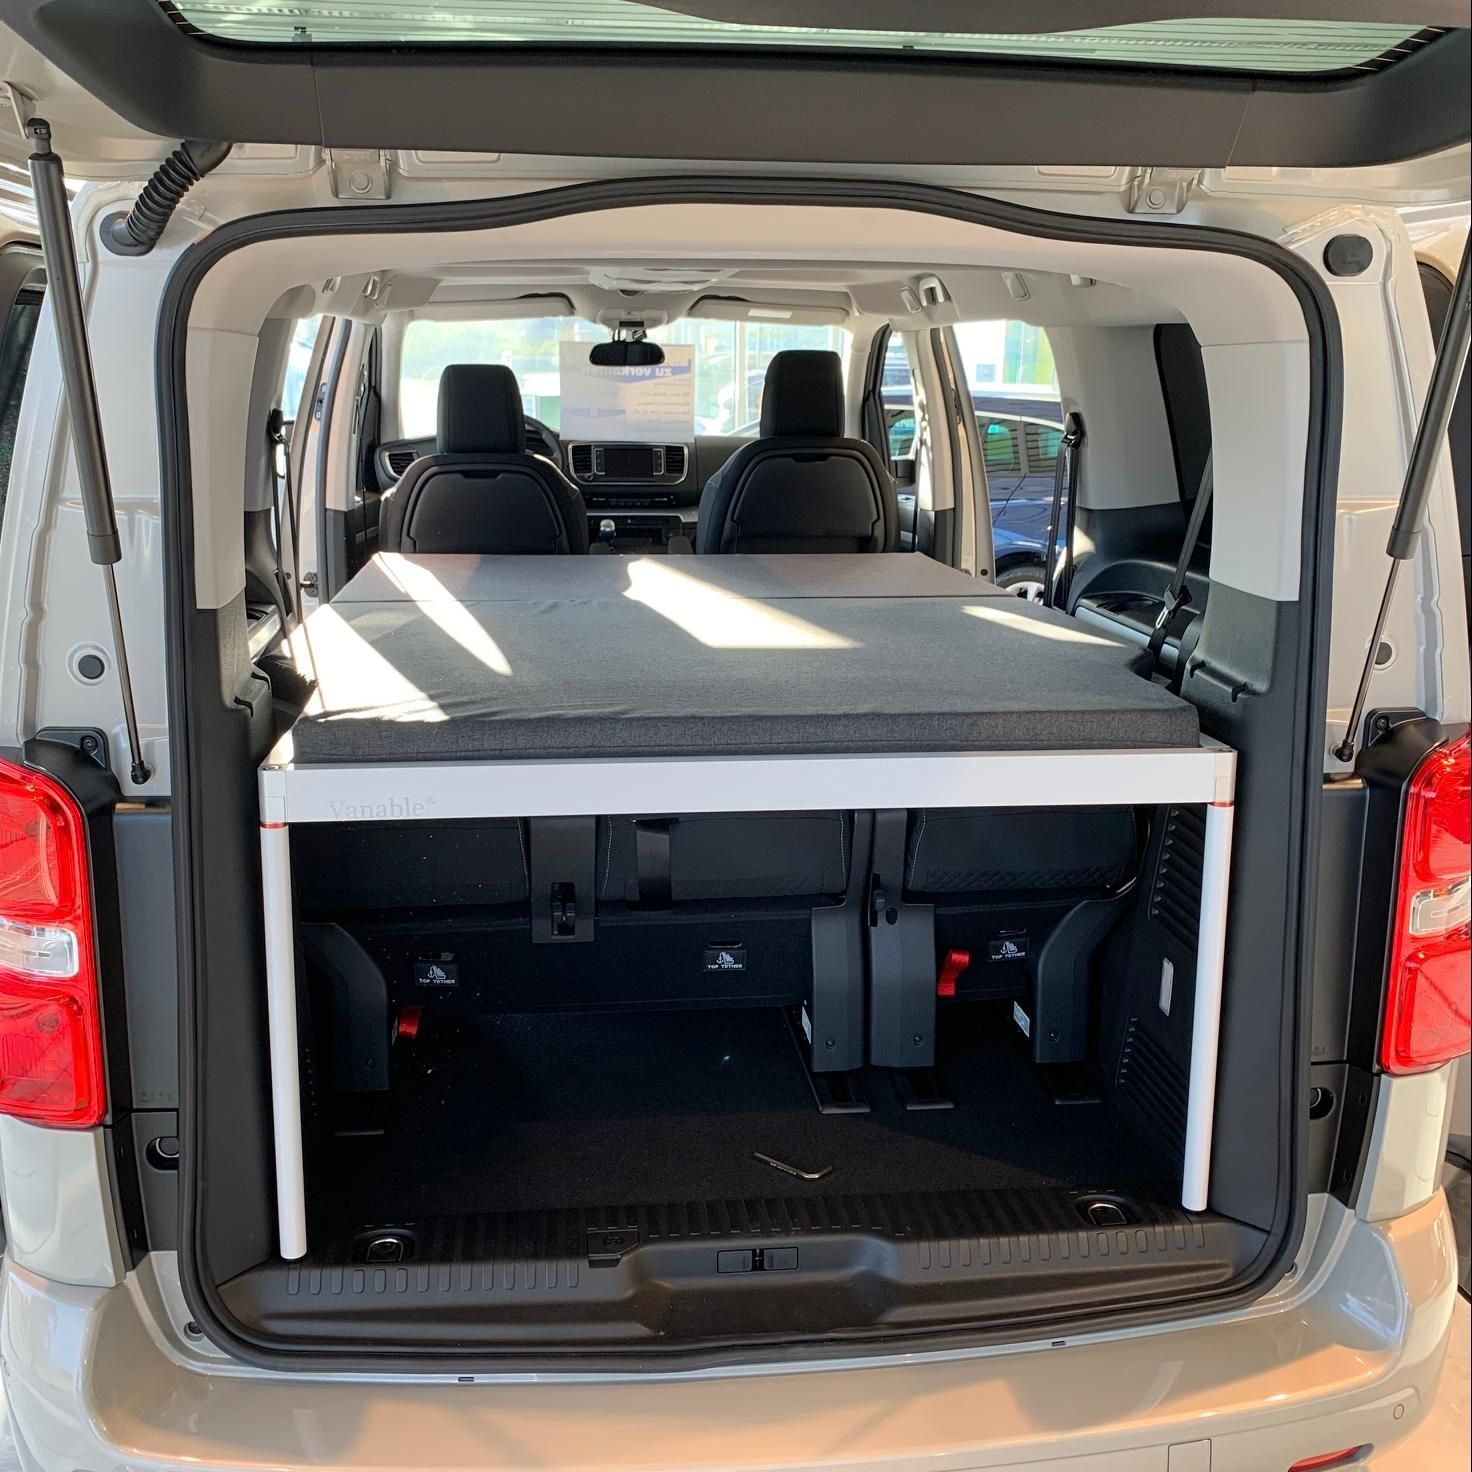 Opel Zafira Life M L2 Vanable Macht Jeden Van Zum Wohnmobil In 2020 Minivan Camping Wohnmobil Kleintransporter